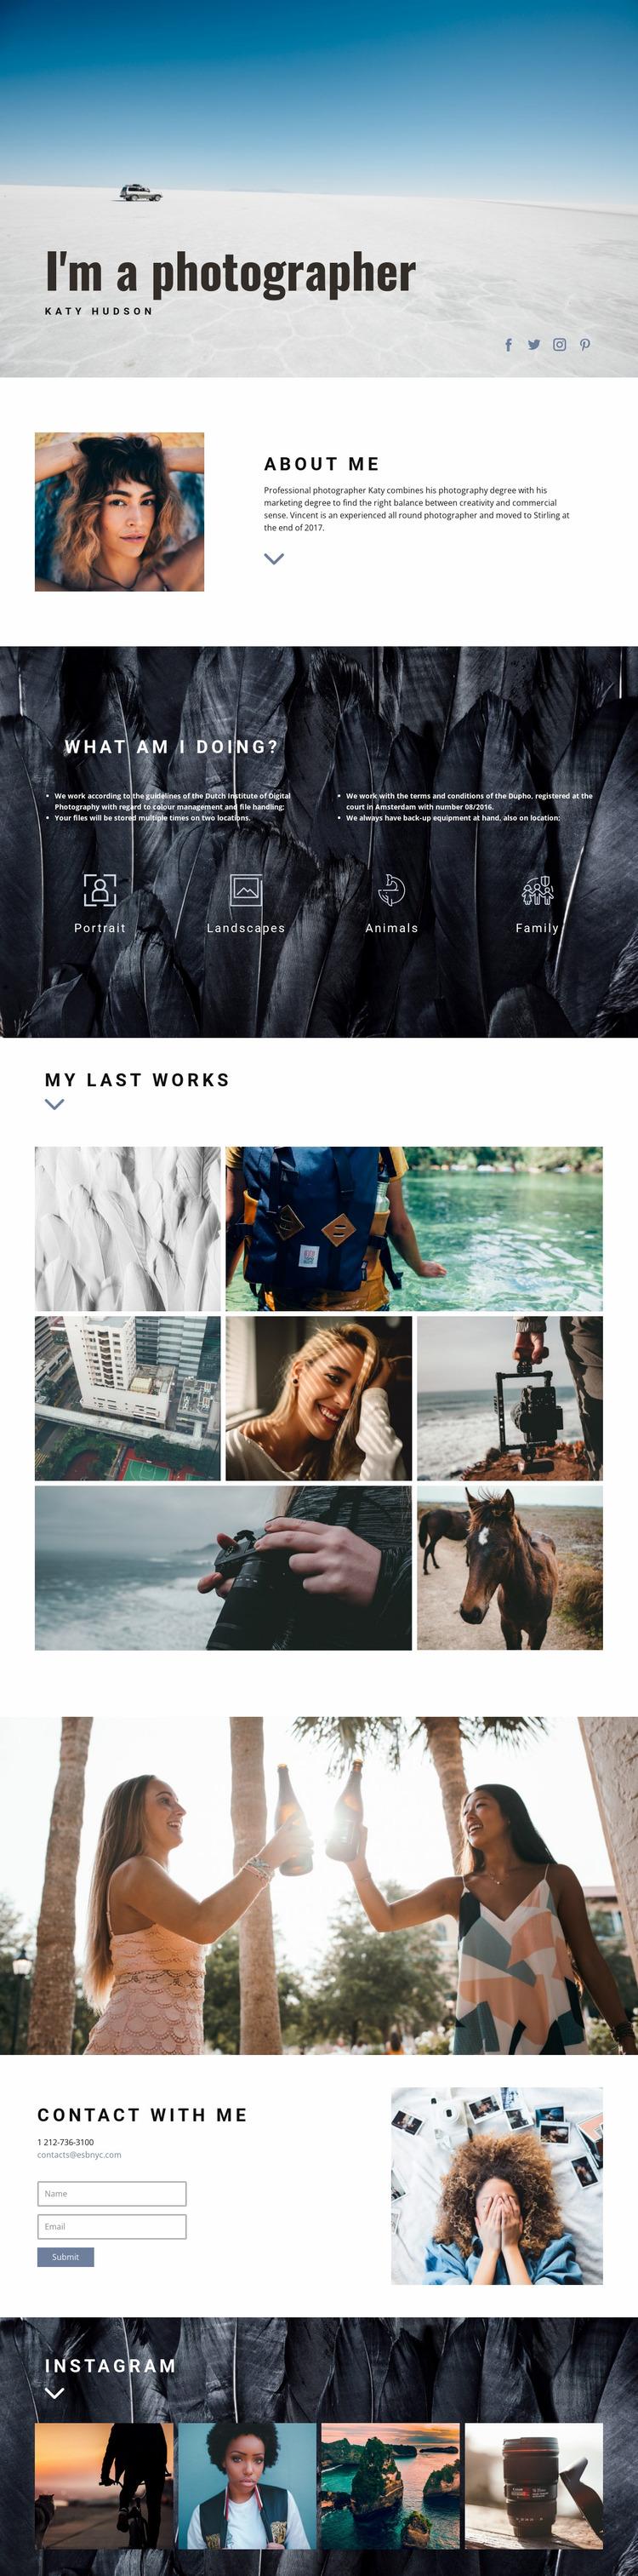 Personal webiste art Website Mockup